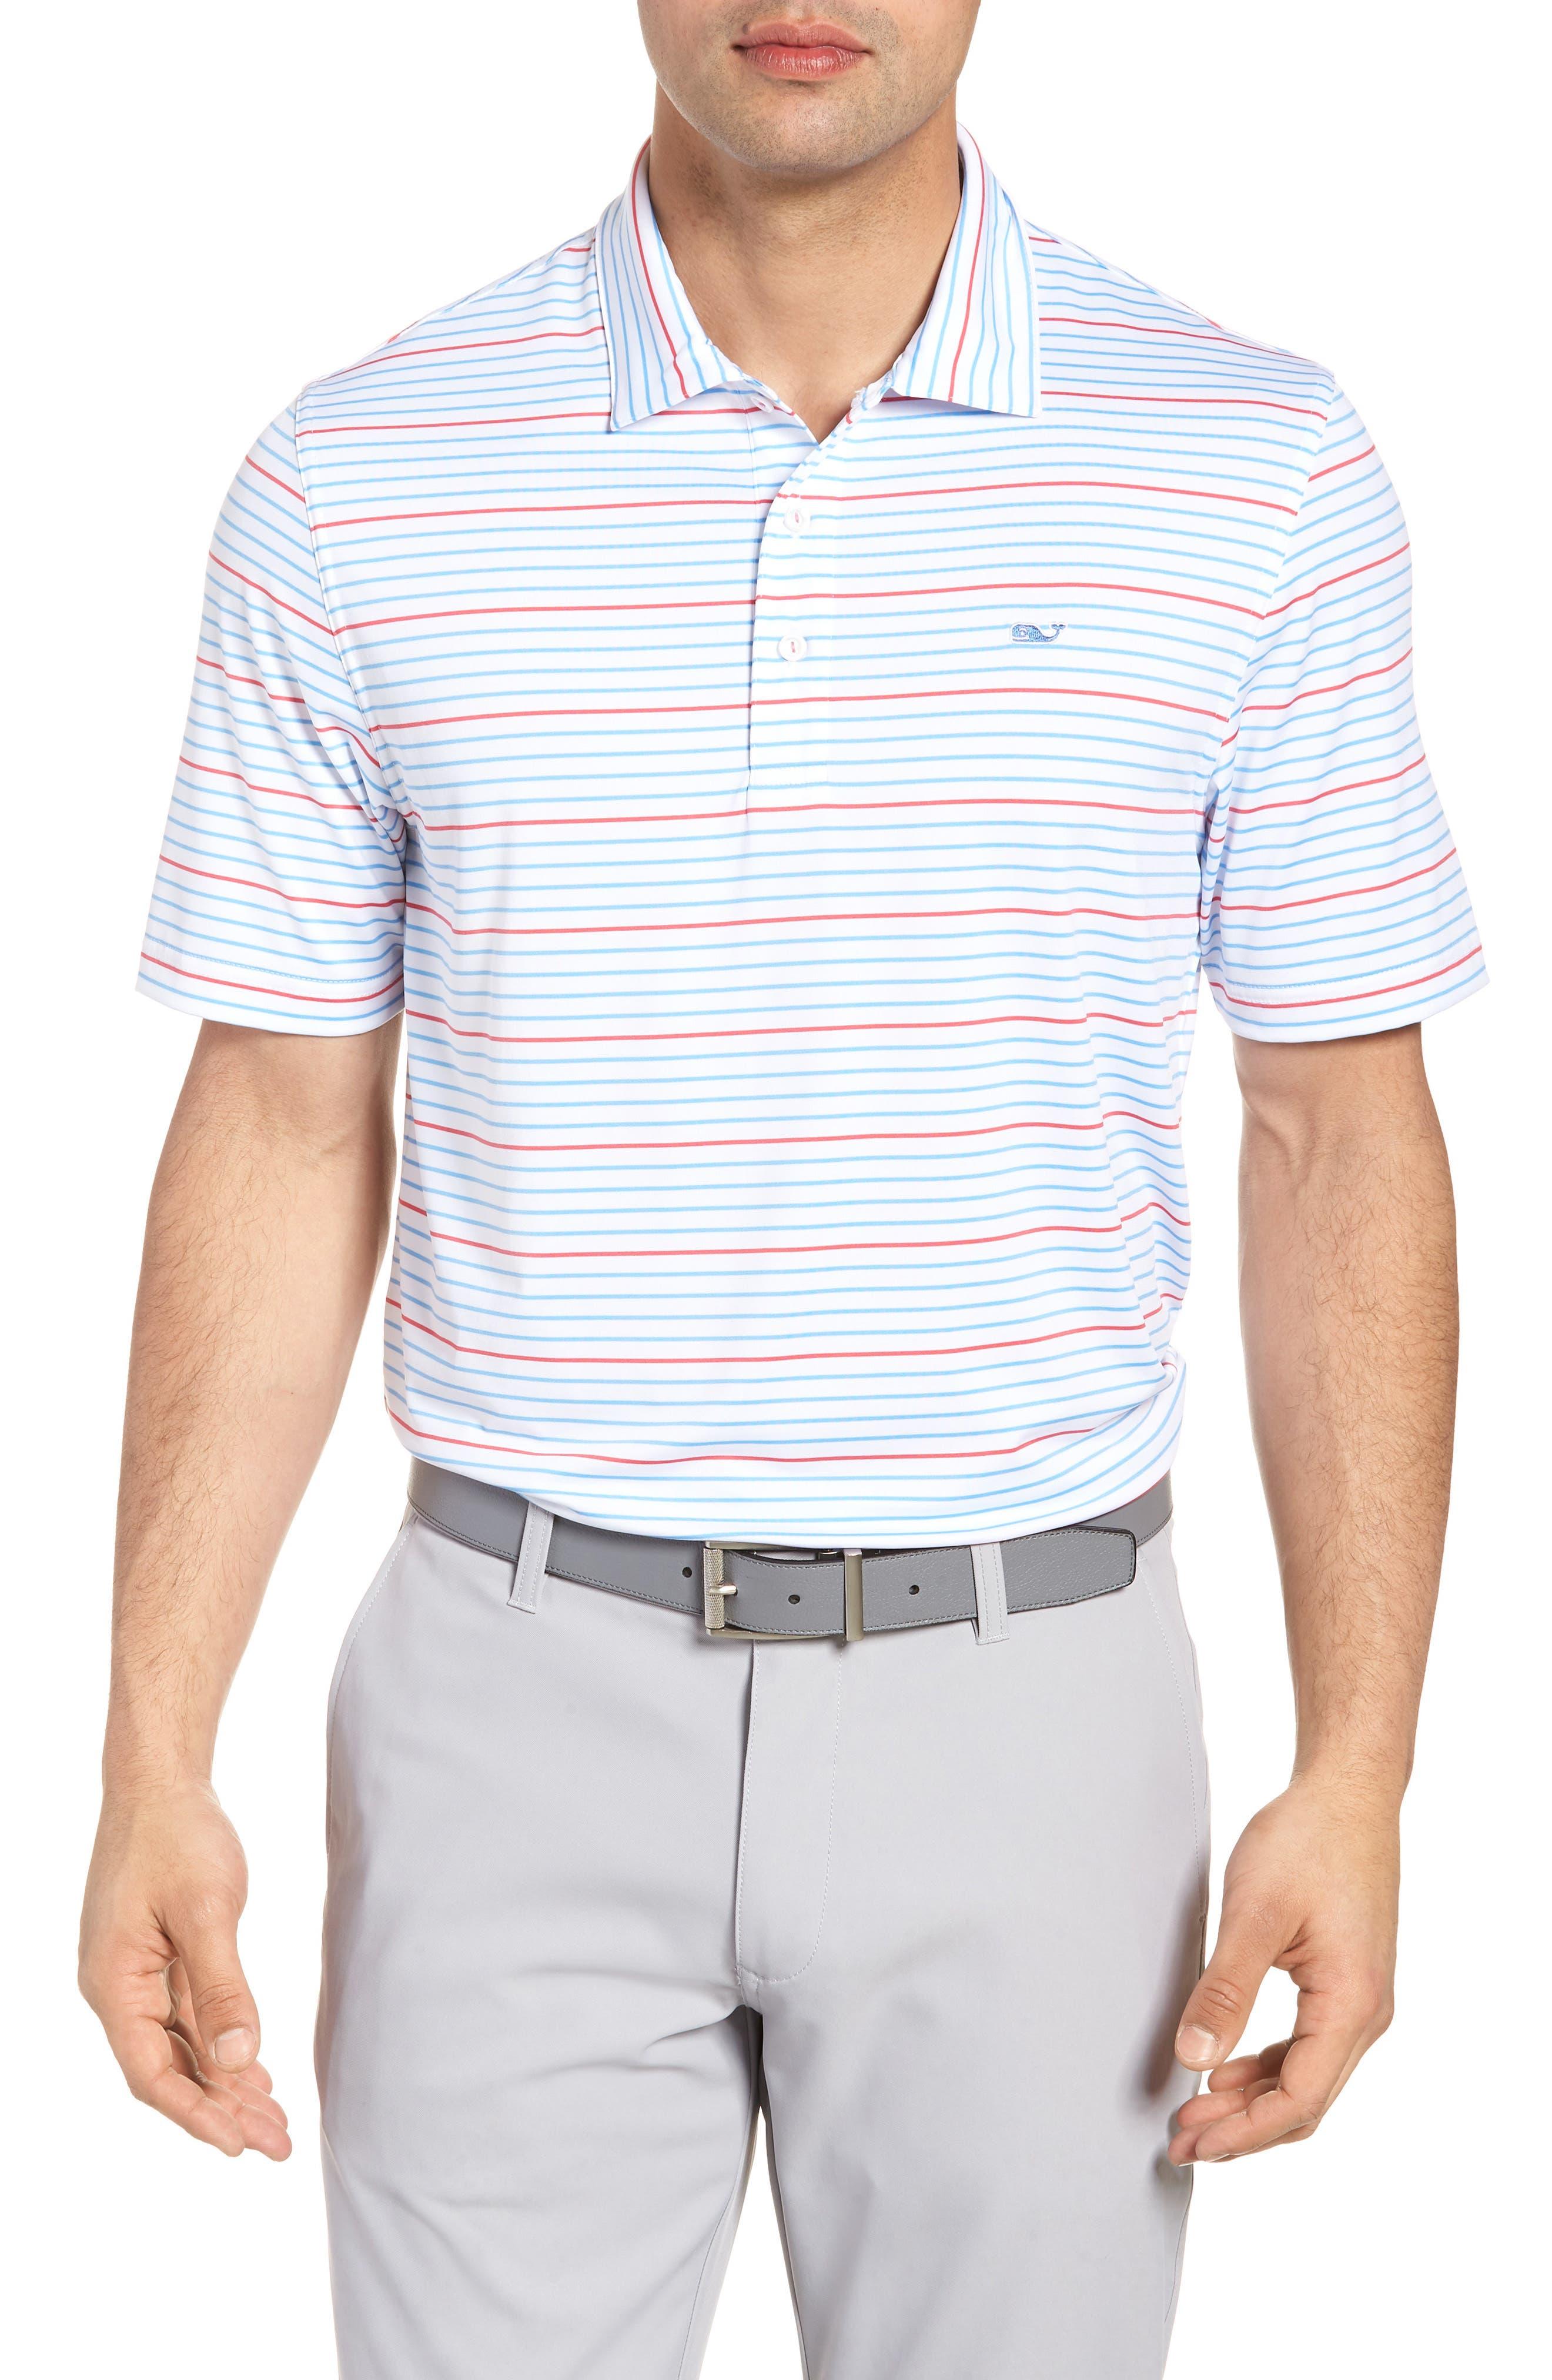 Swindell Stretch Stripe Polo,                         Main,                         color, 100